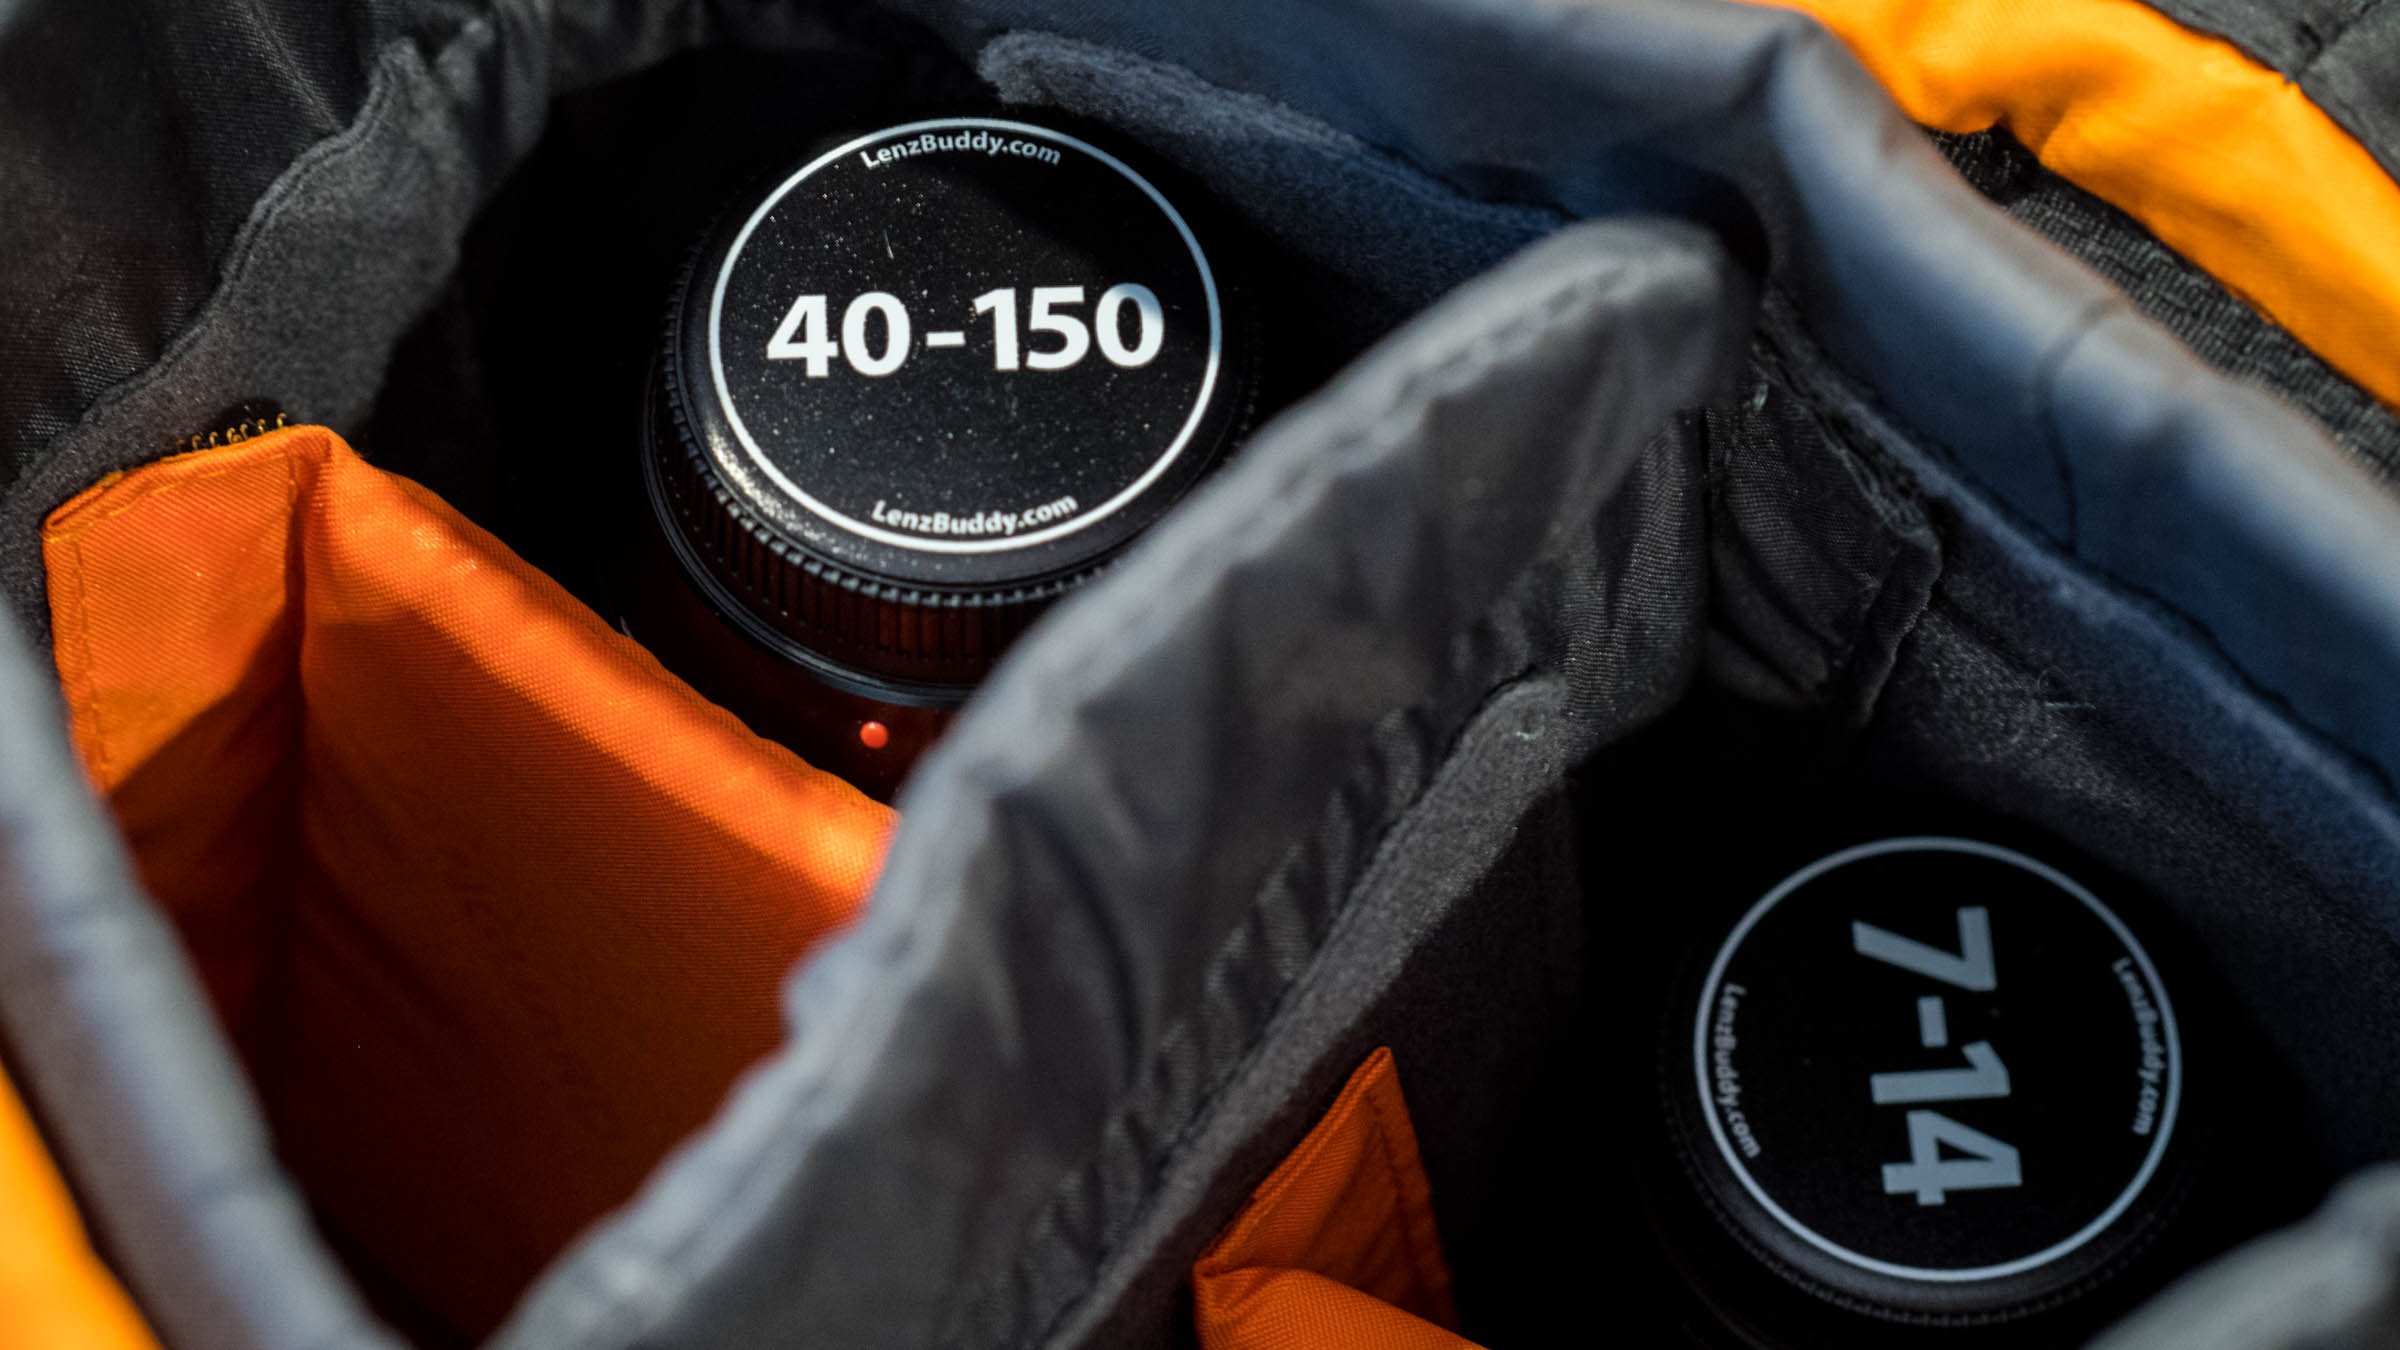 LenzBuddy Solves a Common Camera Gear Problem | Photofocus